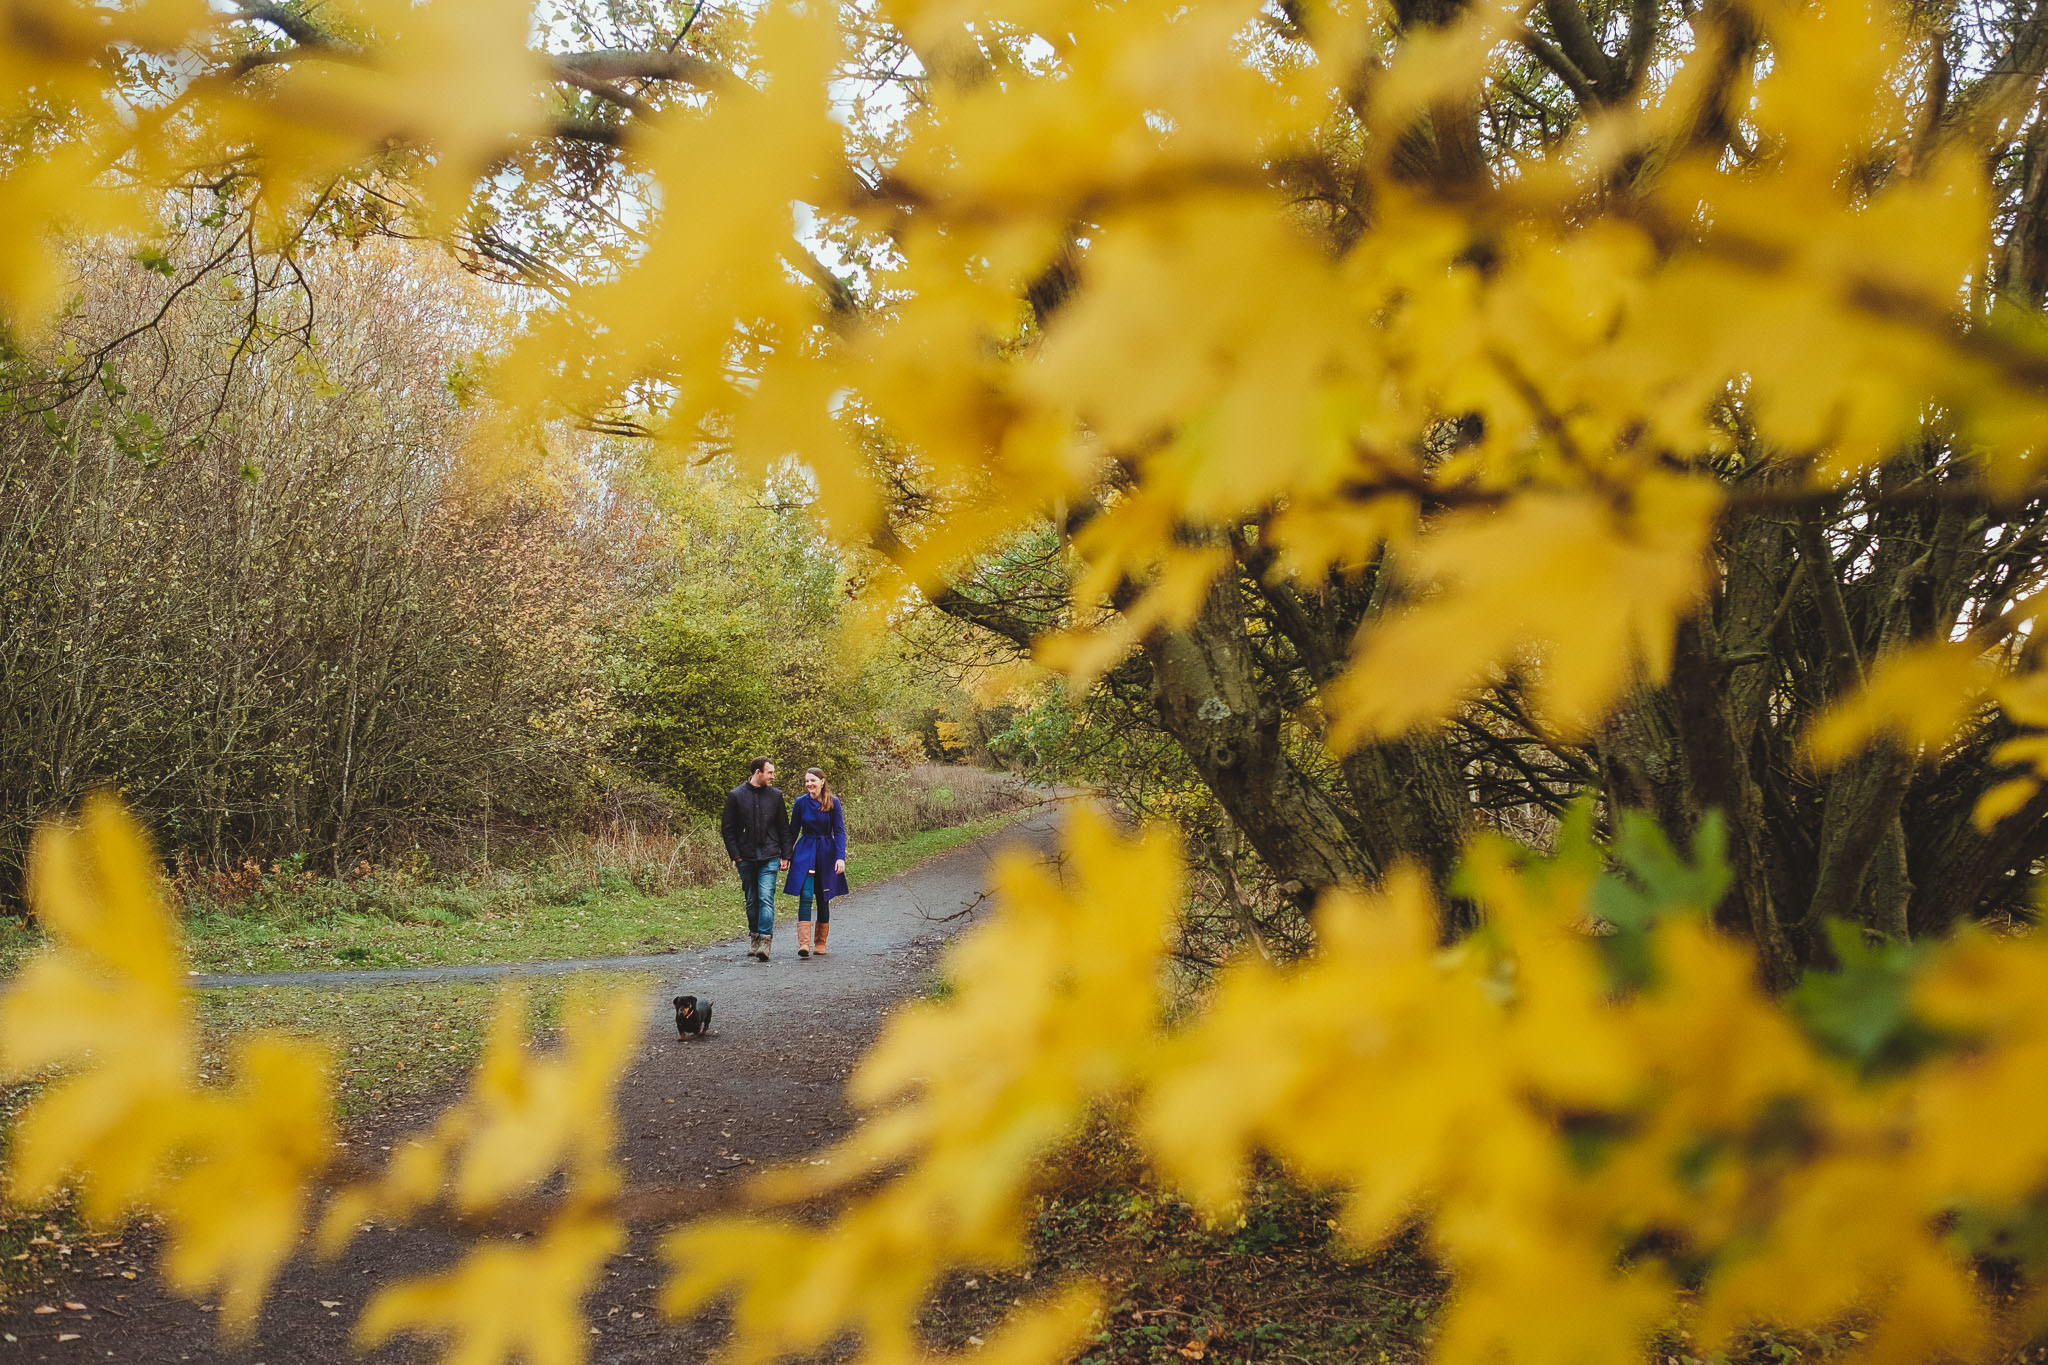 Engaged couple glimpsed through the orange autumn foliage in Newcastle